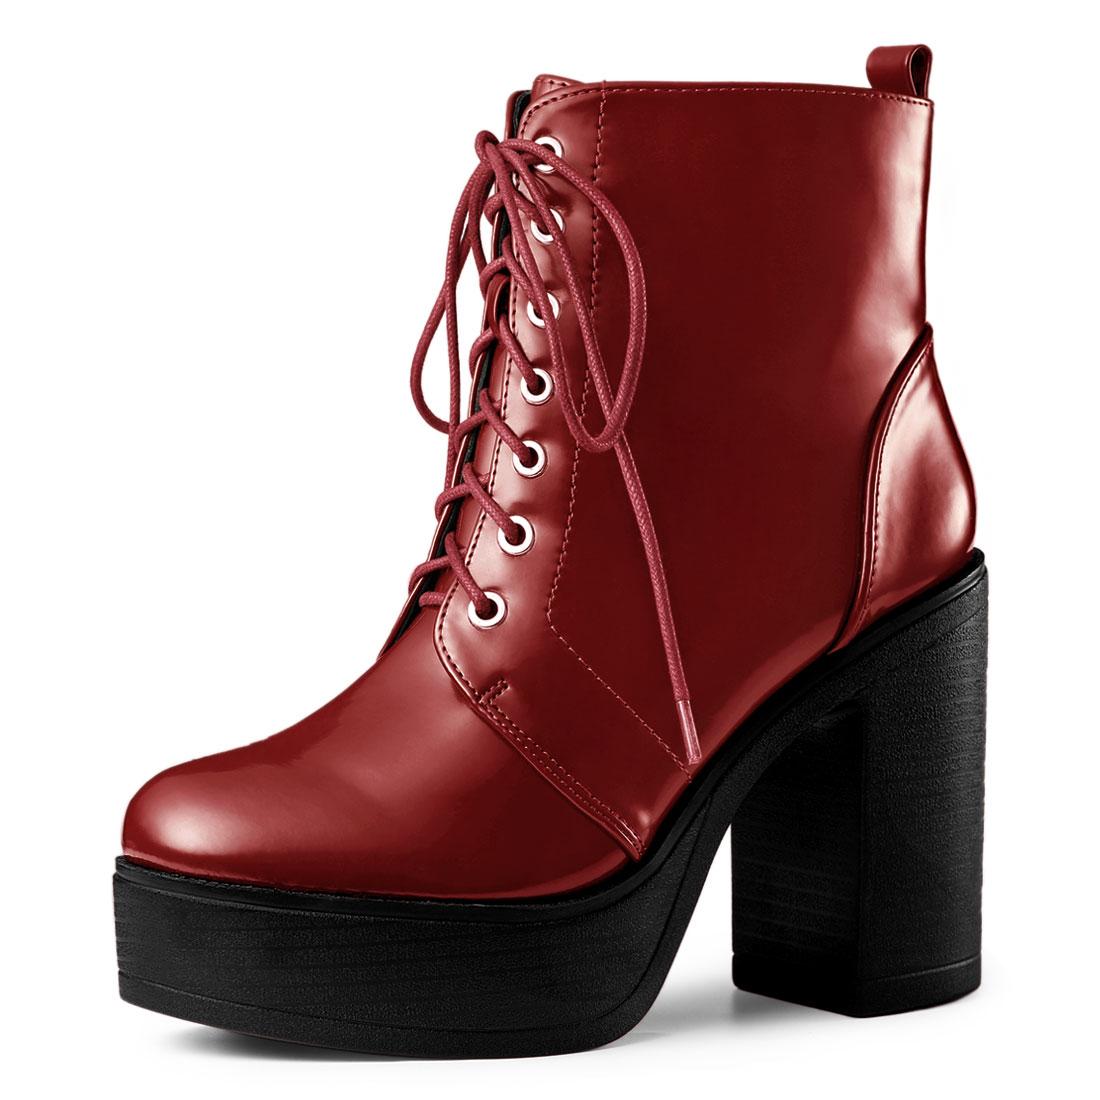 Allegra K Women's Platform Chunky High Heel Lace Up Combat Boots Red US 10